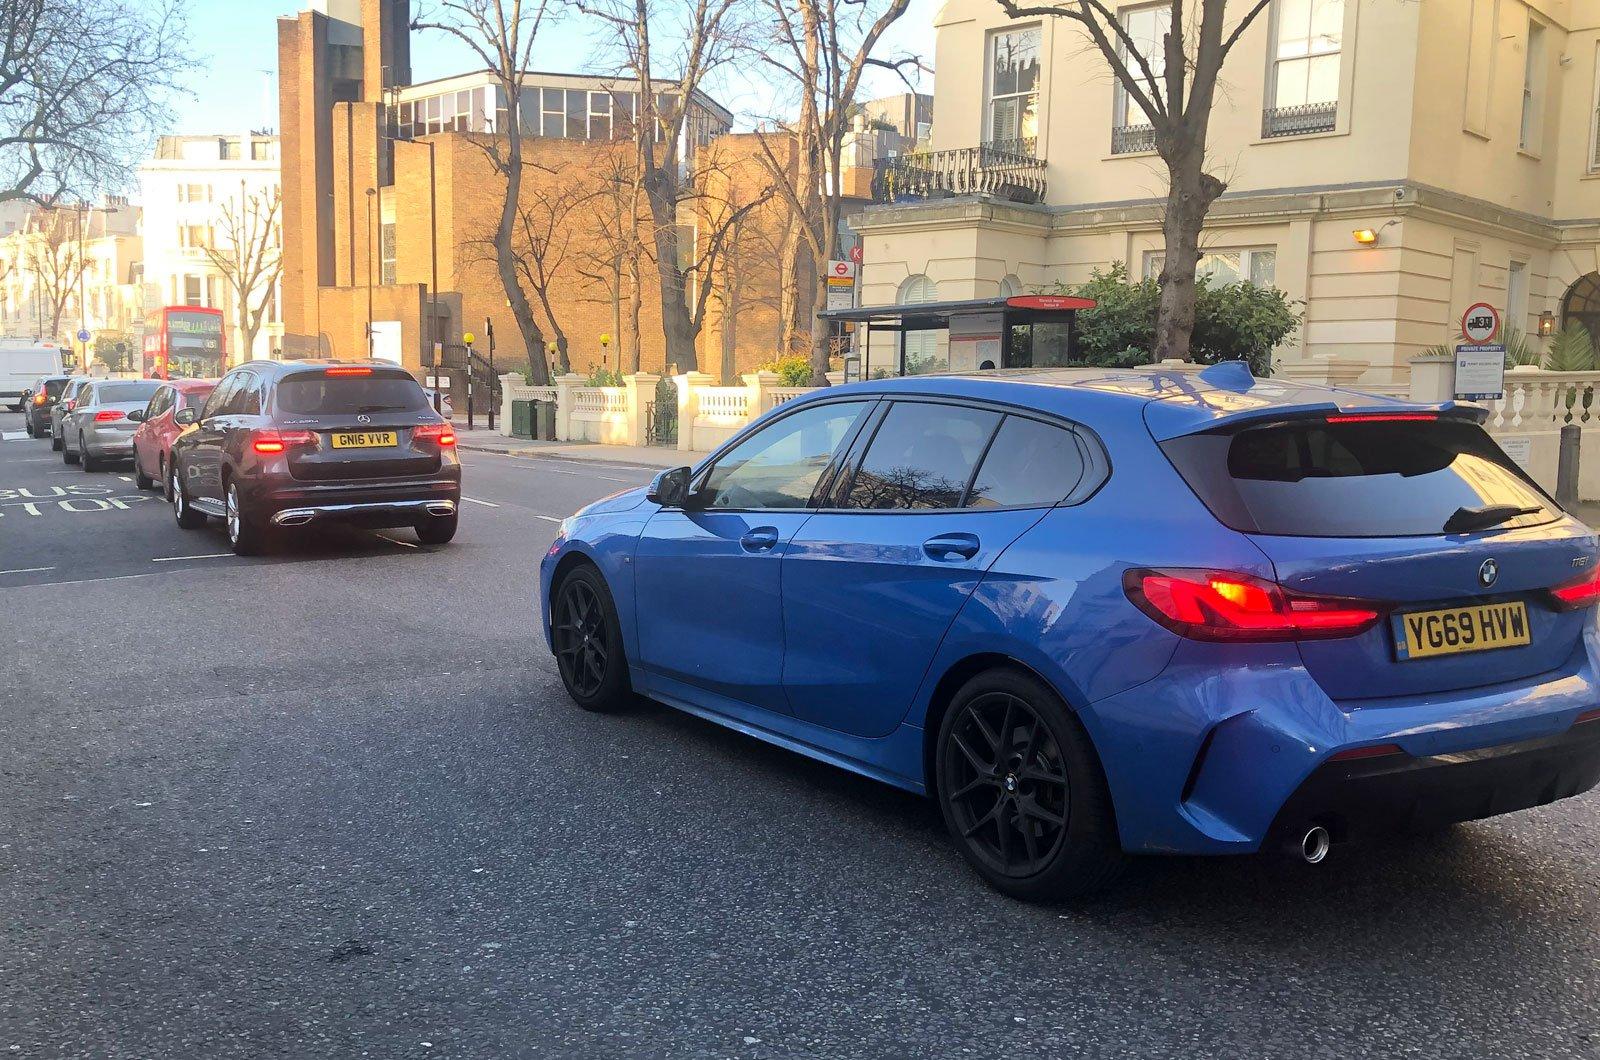 BMW 1 Series in traffic car length space